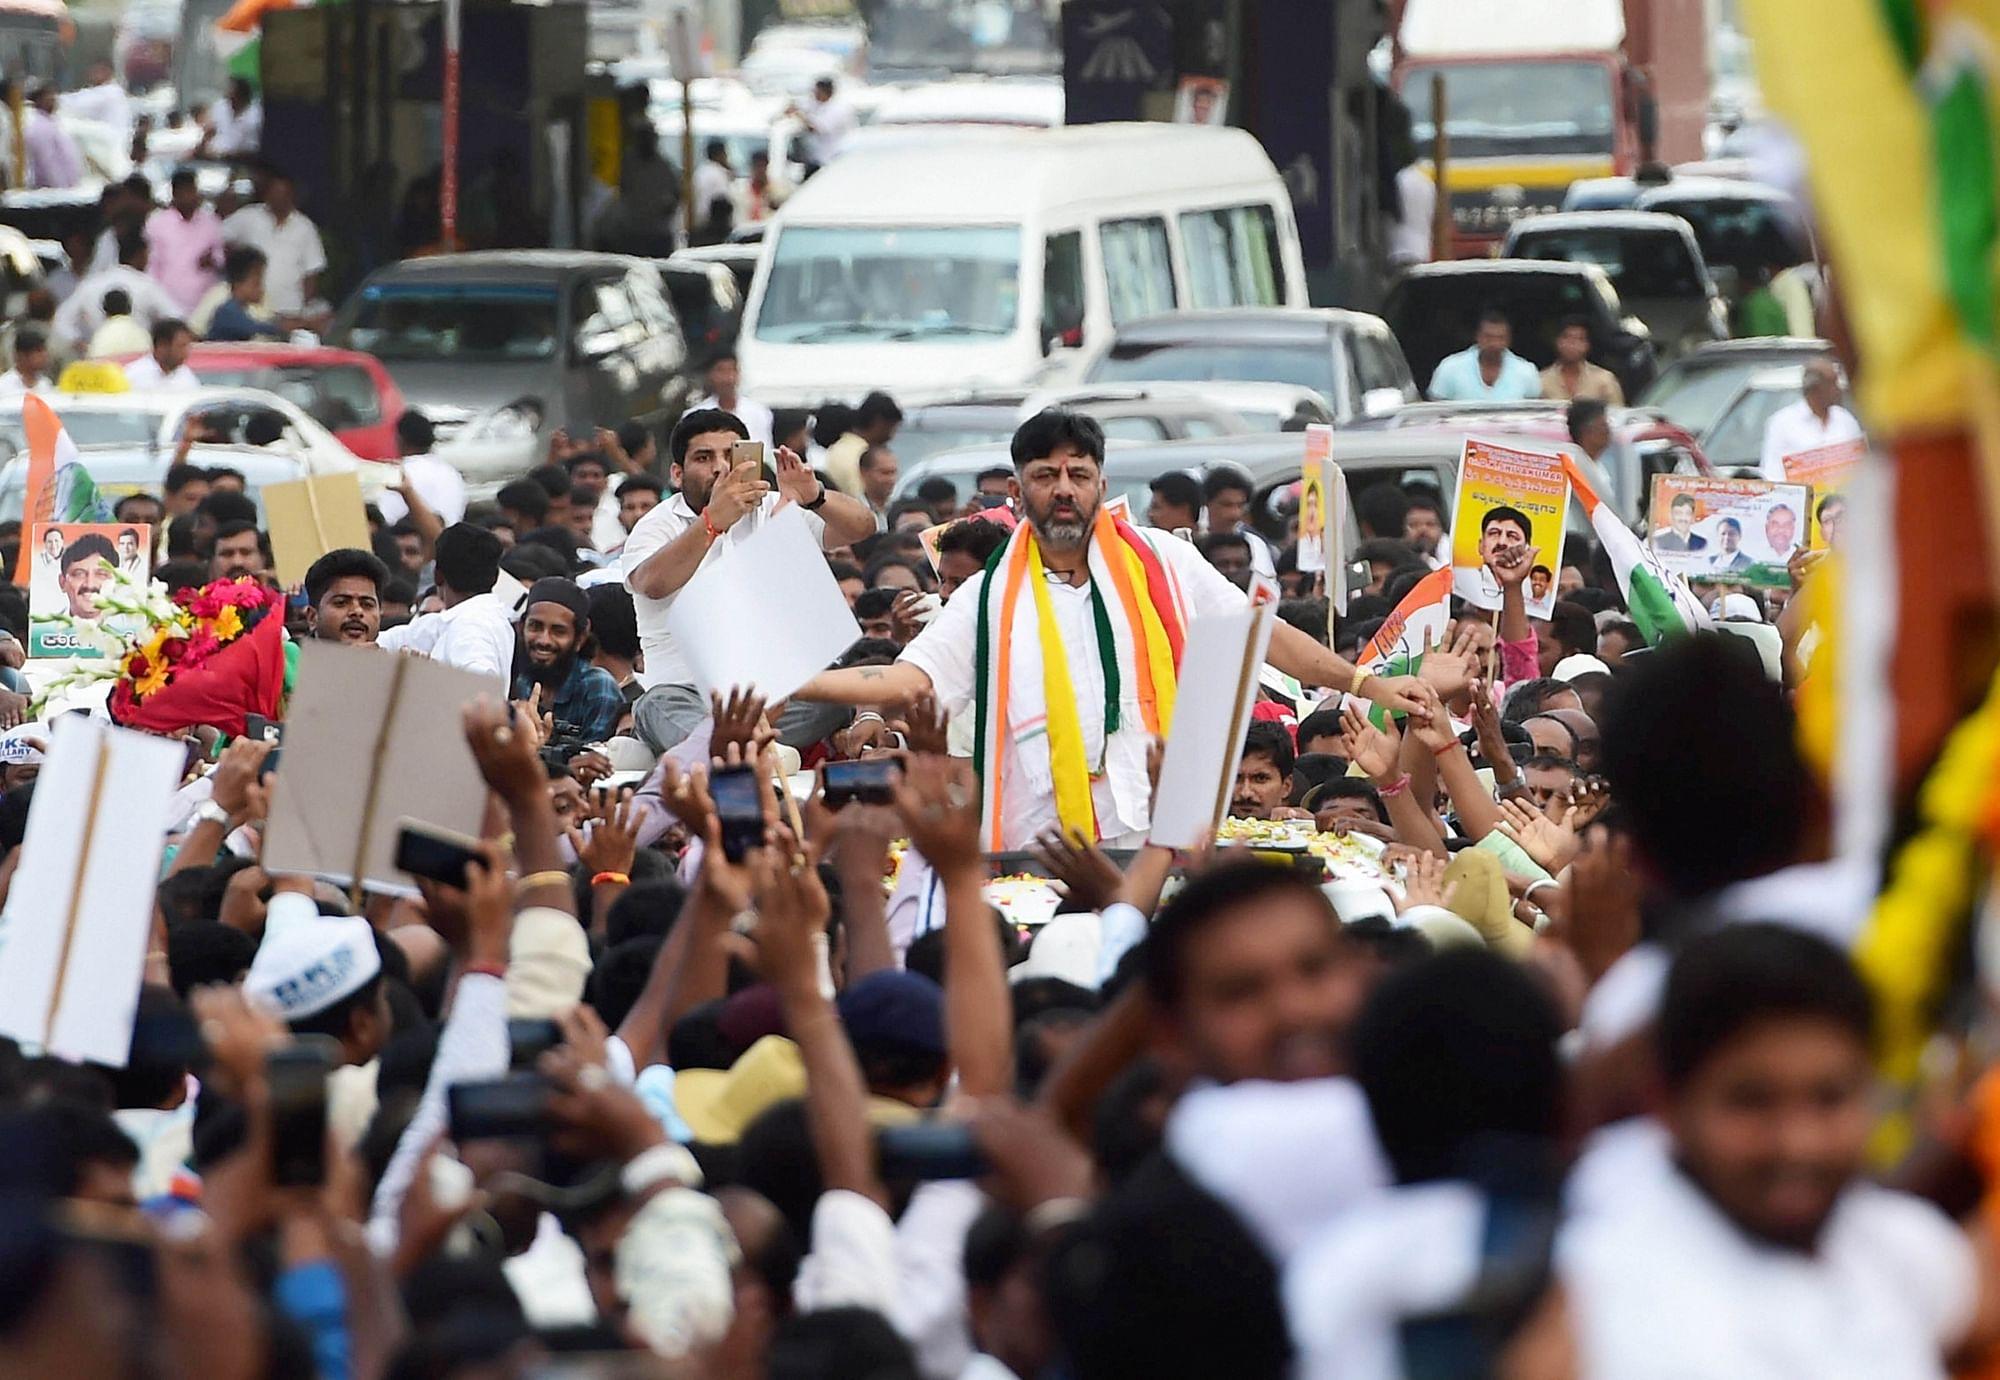 DK Shivakumar after arriving in Bengaluru.